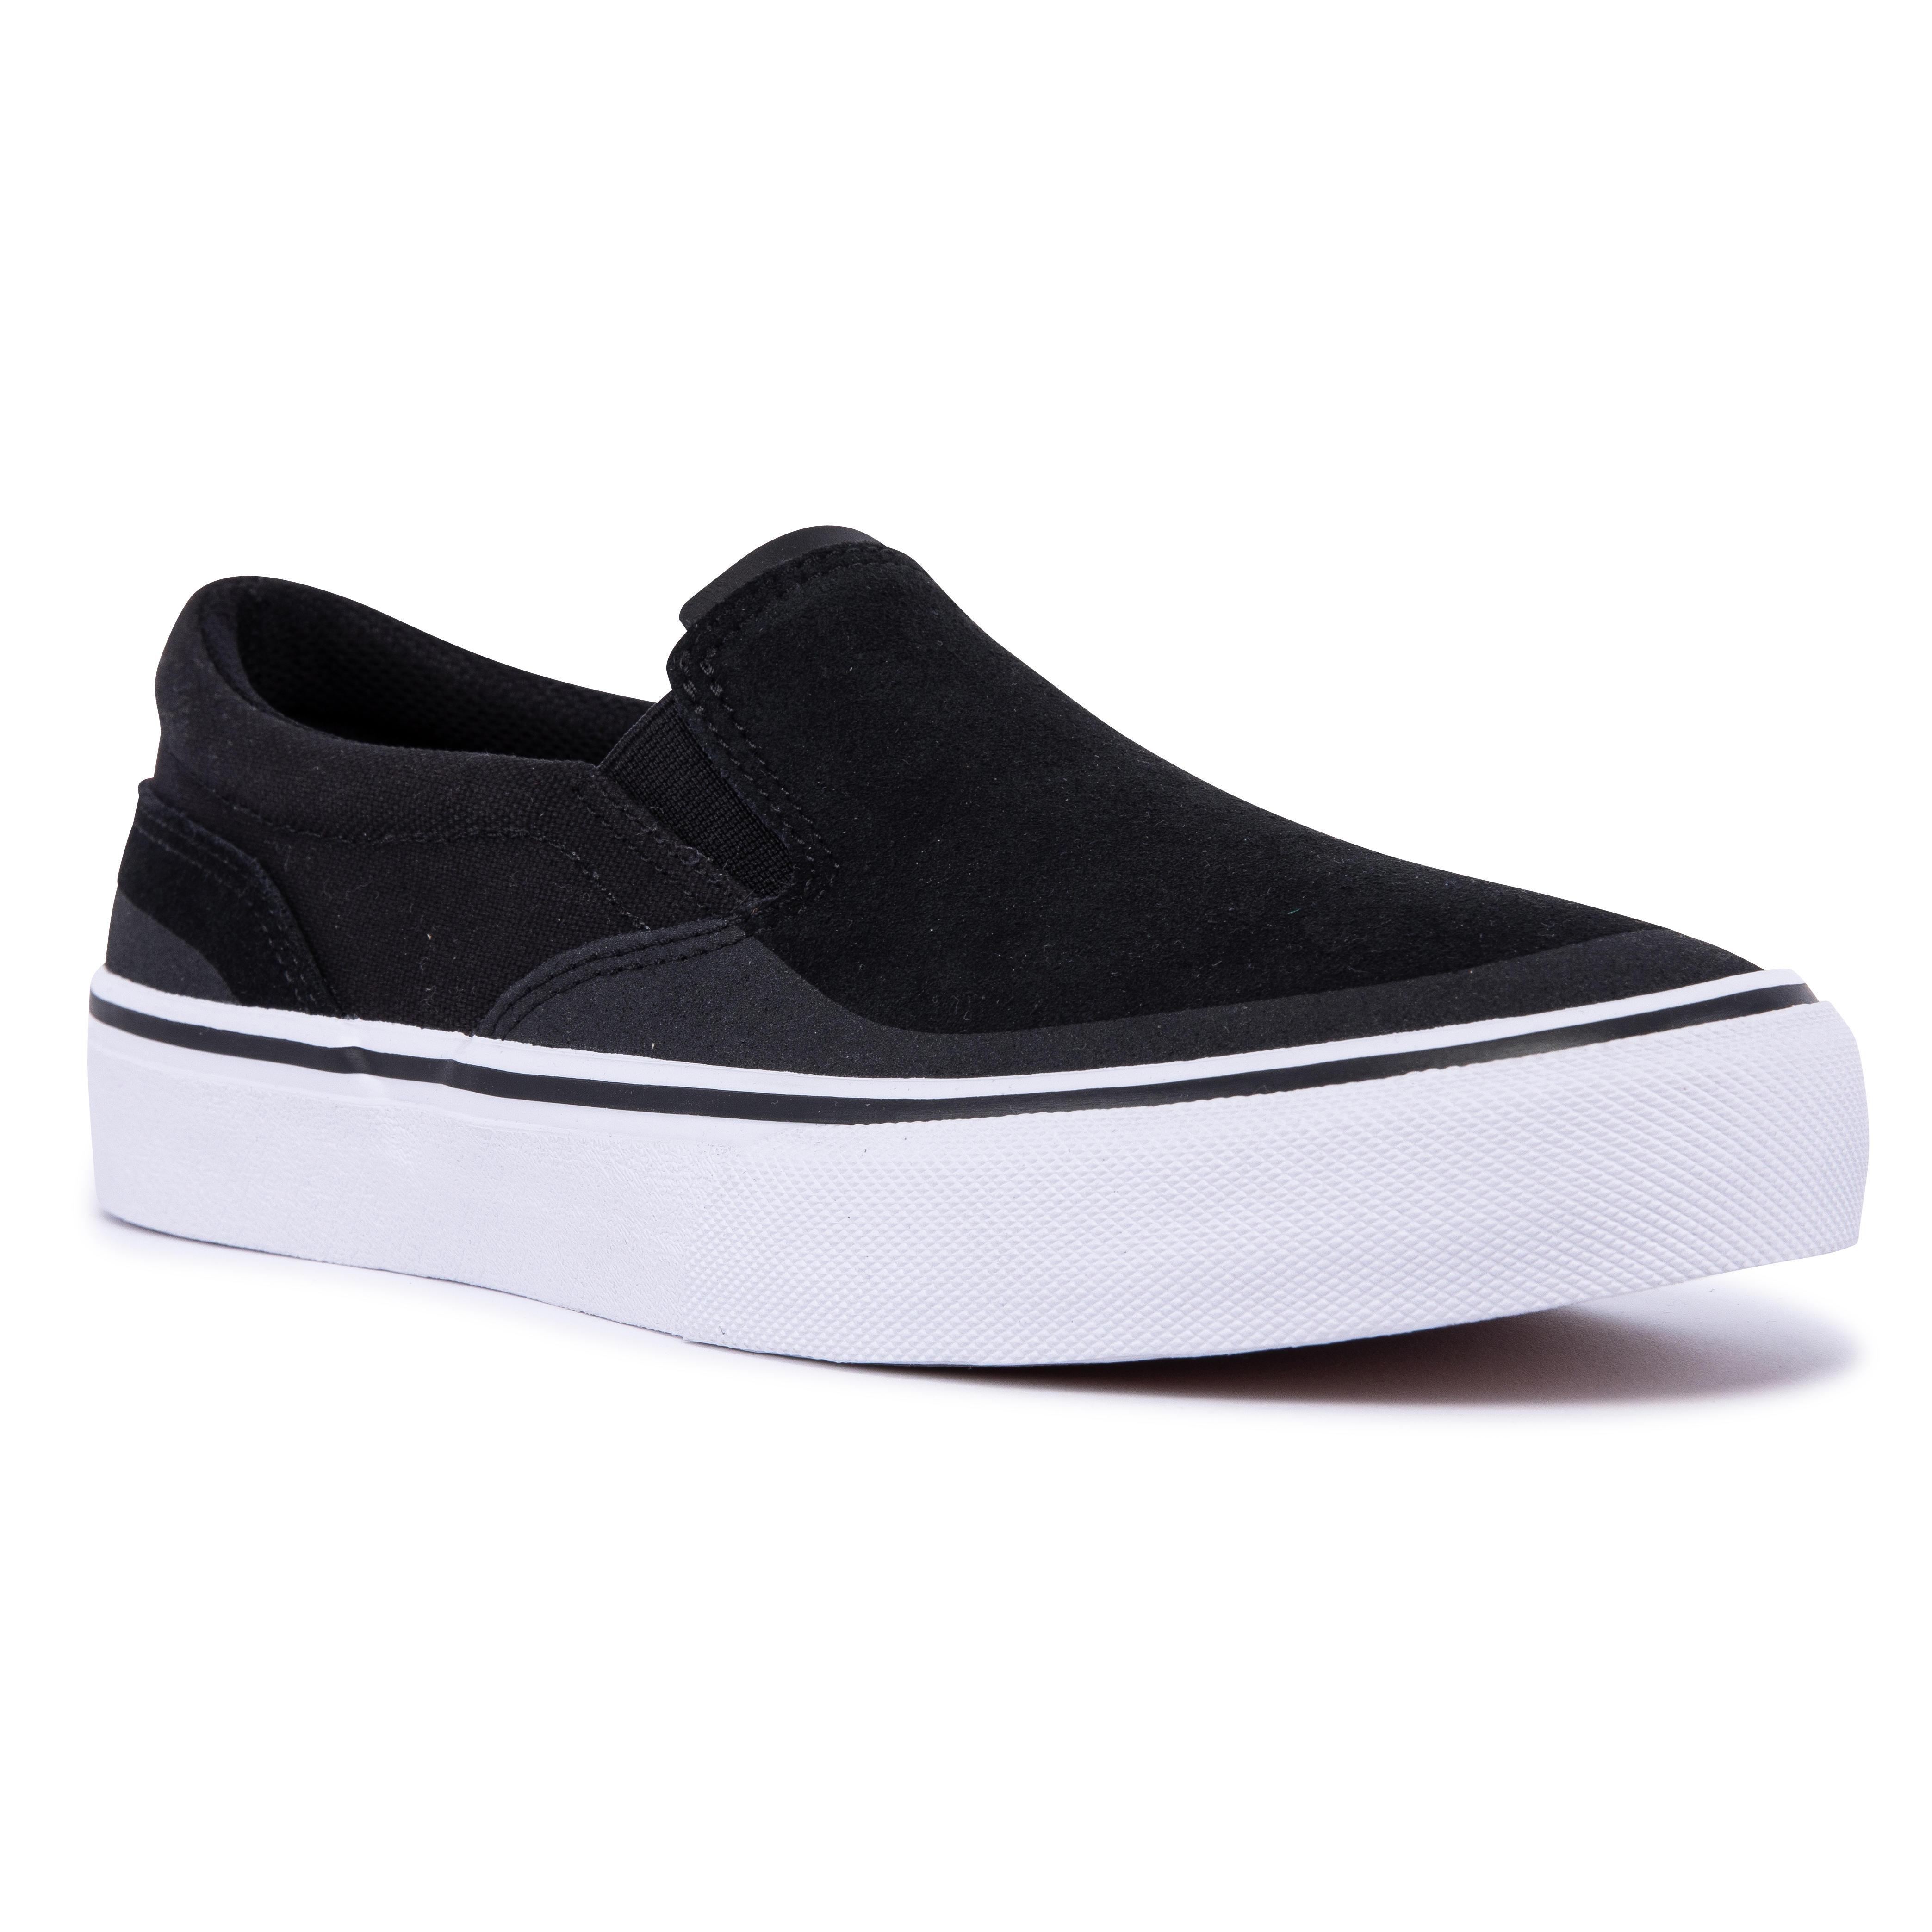 Oxelo Chaussures basses Slip-On de skateboard adulte VULCA 500 noire / blanc - Oxelo